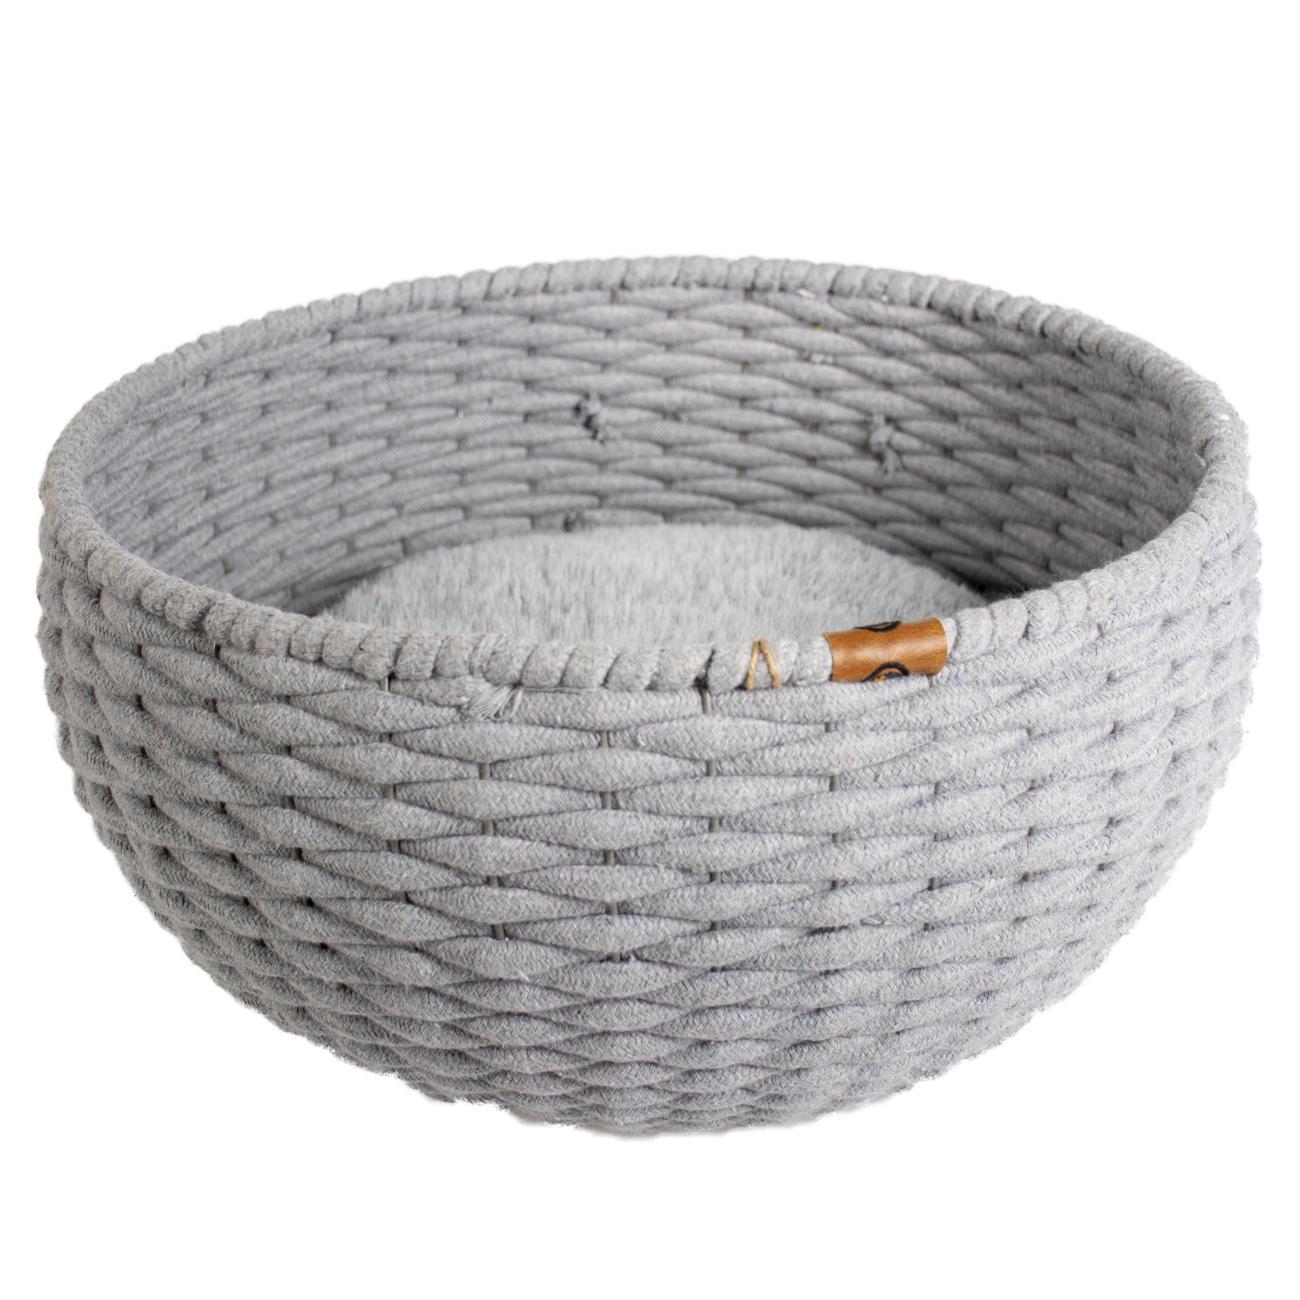 ebi Duvo+ Oyster Basket Round In Cotton Rope 45x45x23cm Grey